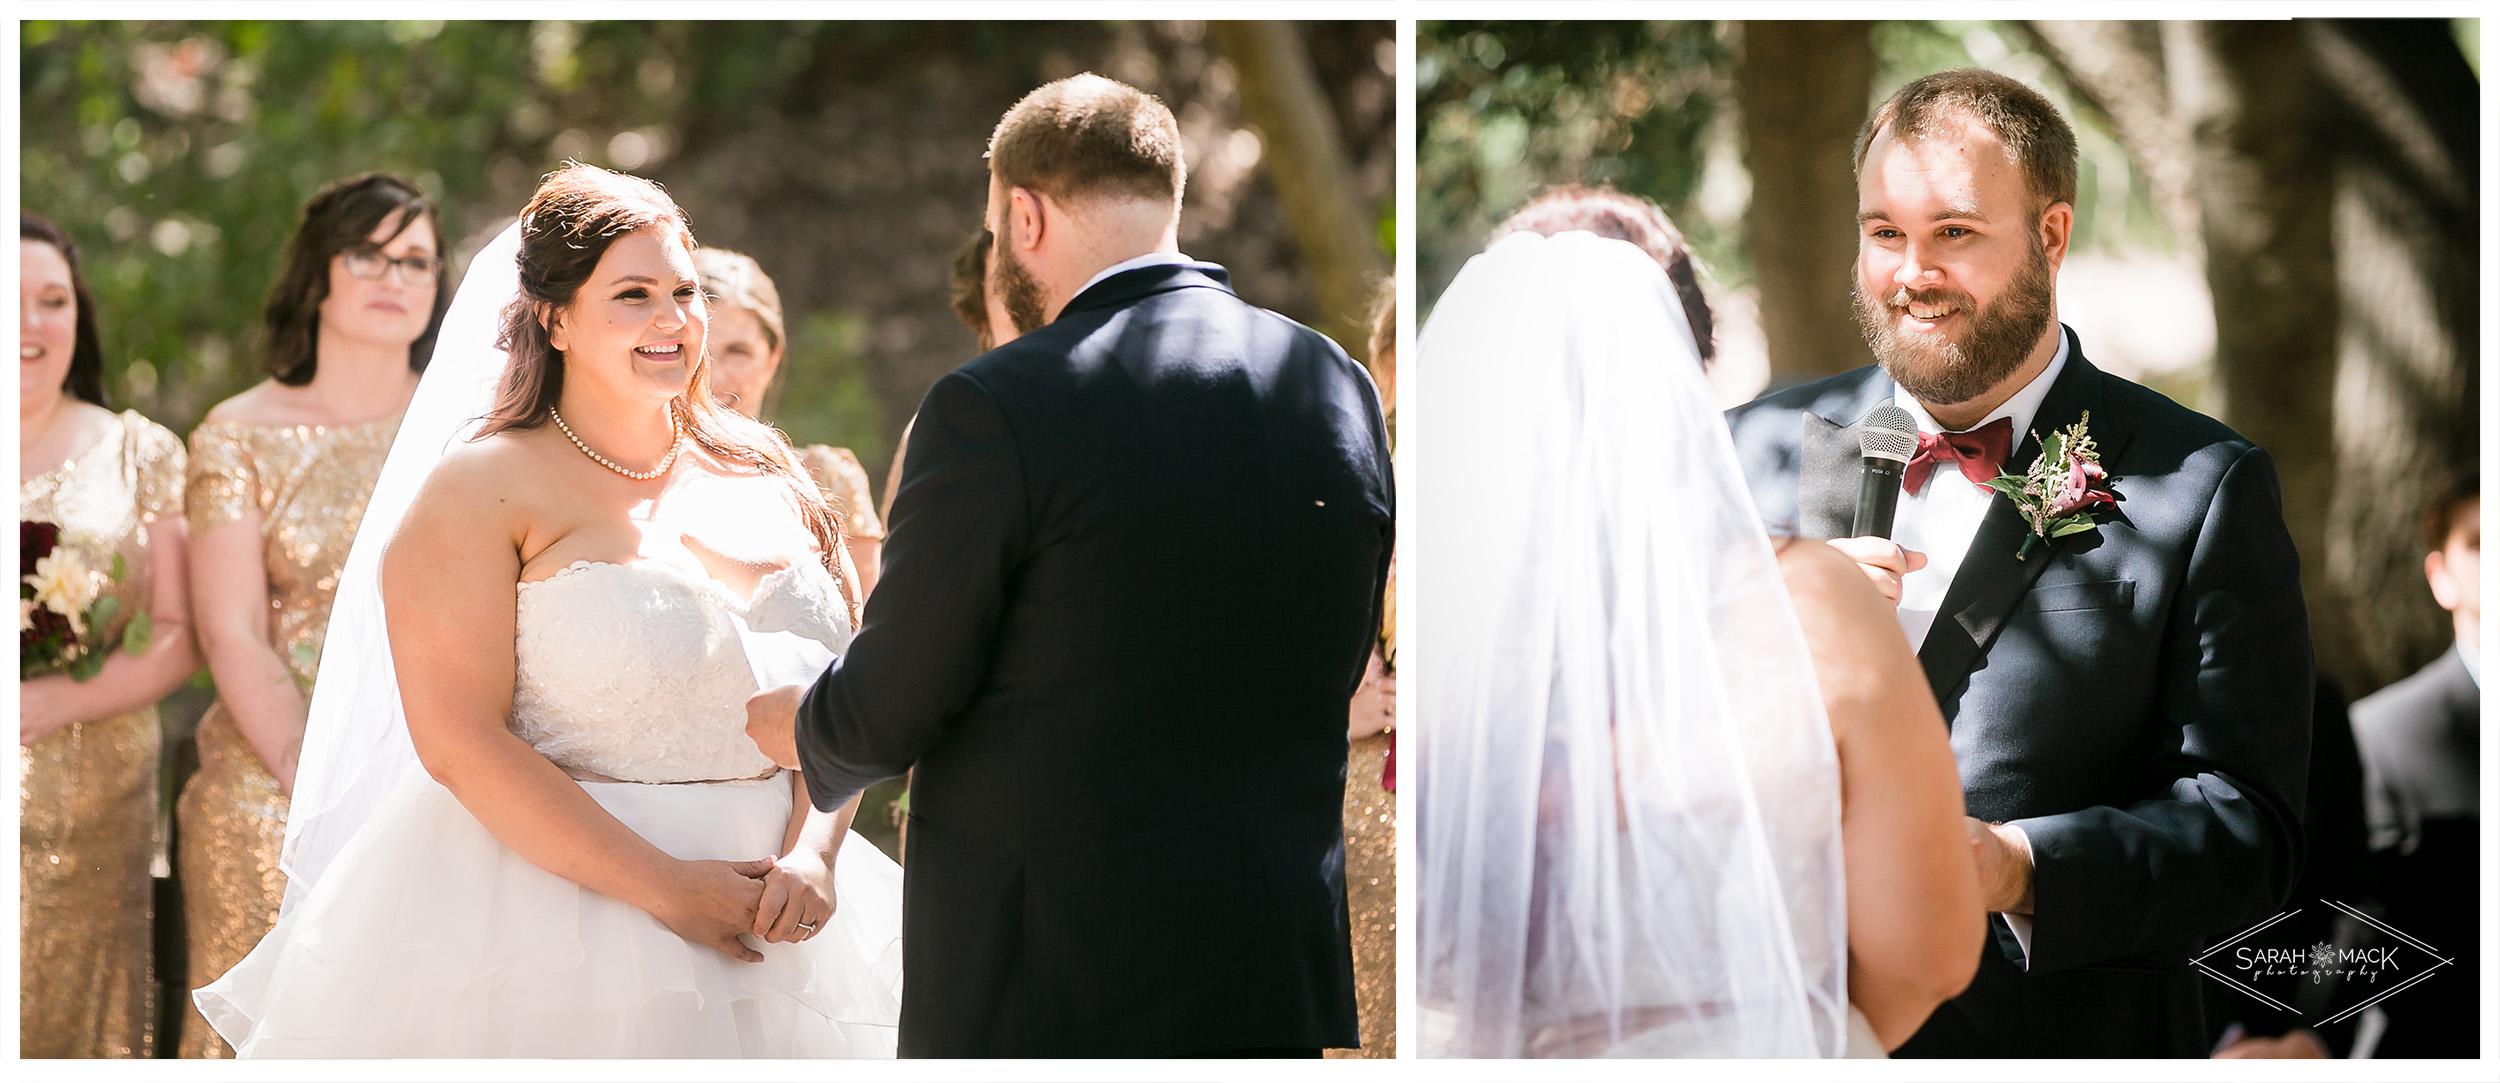 RF-Estate-on-Second-Santa-Ana-Wedding-Photography-32.jpg